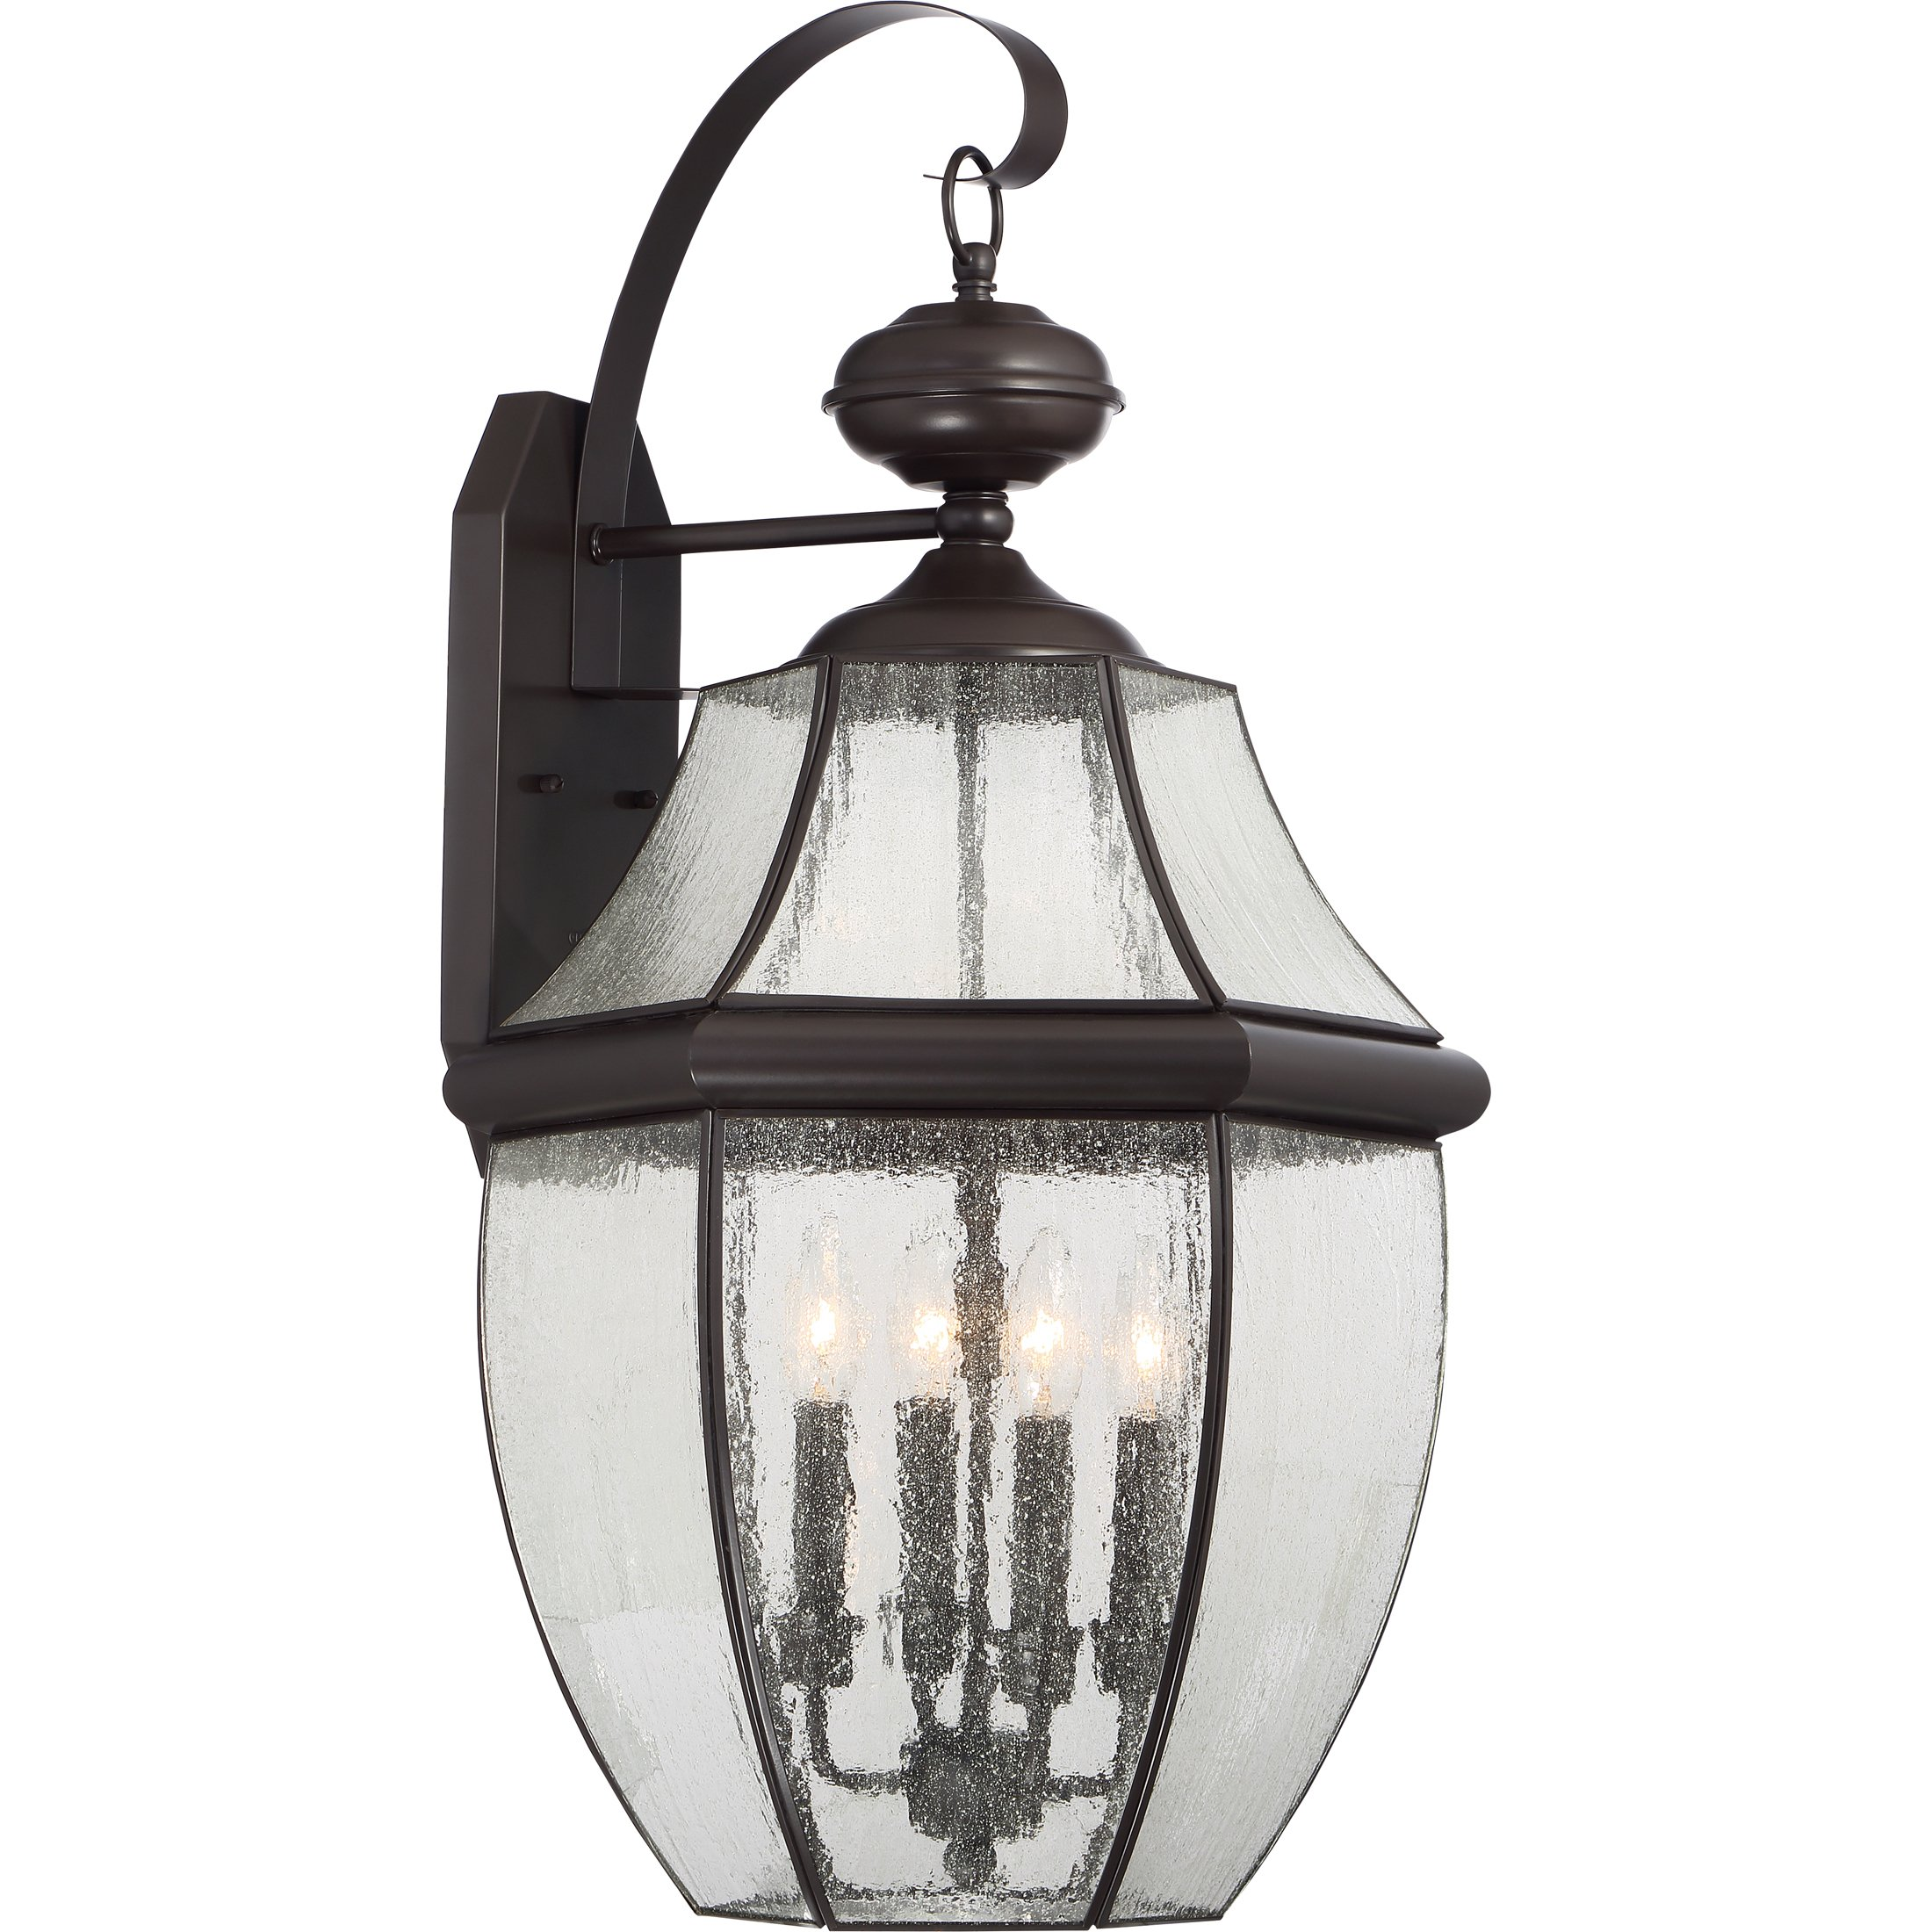 Quoizel NY8416Z 4-Light Newbury Outdoor Lantern in Medici Bronze by Quoizel